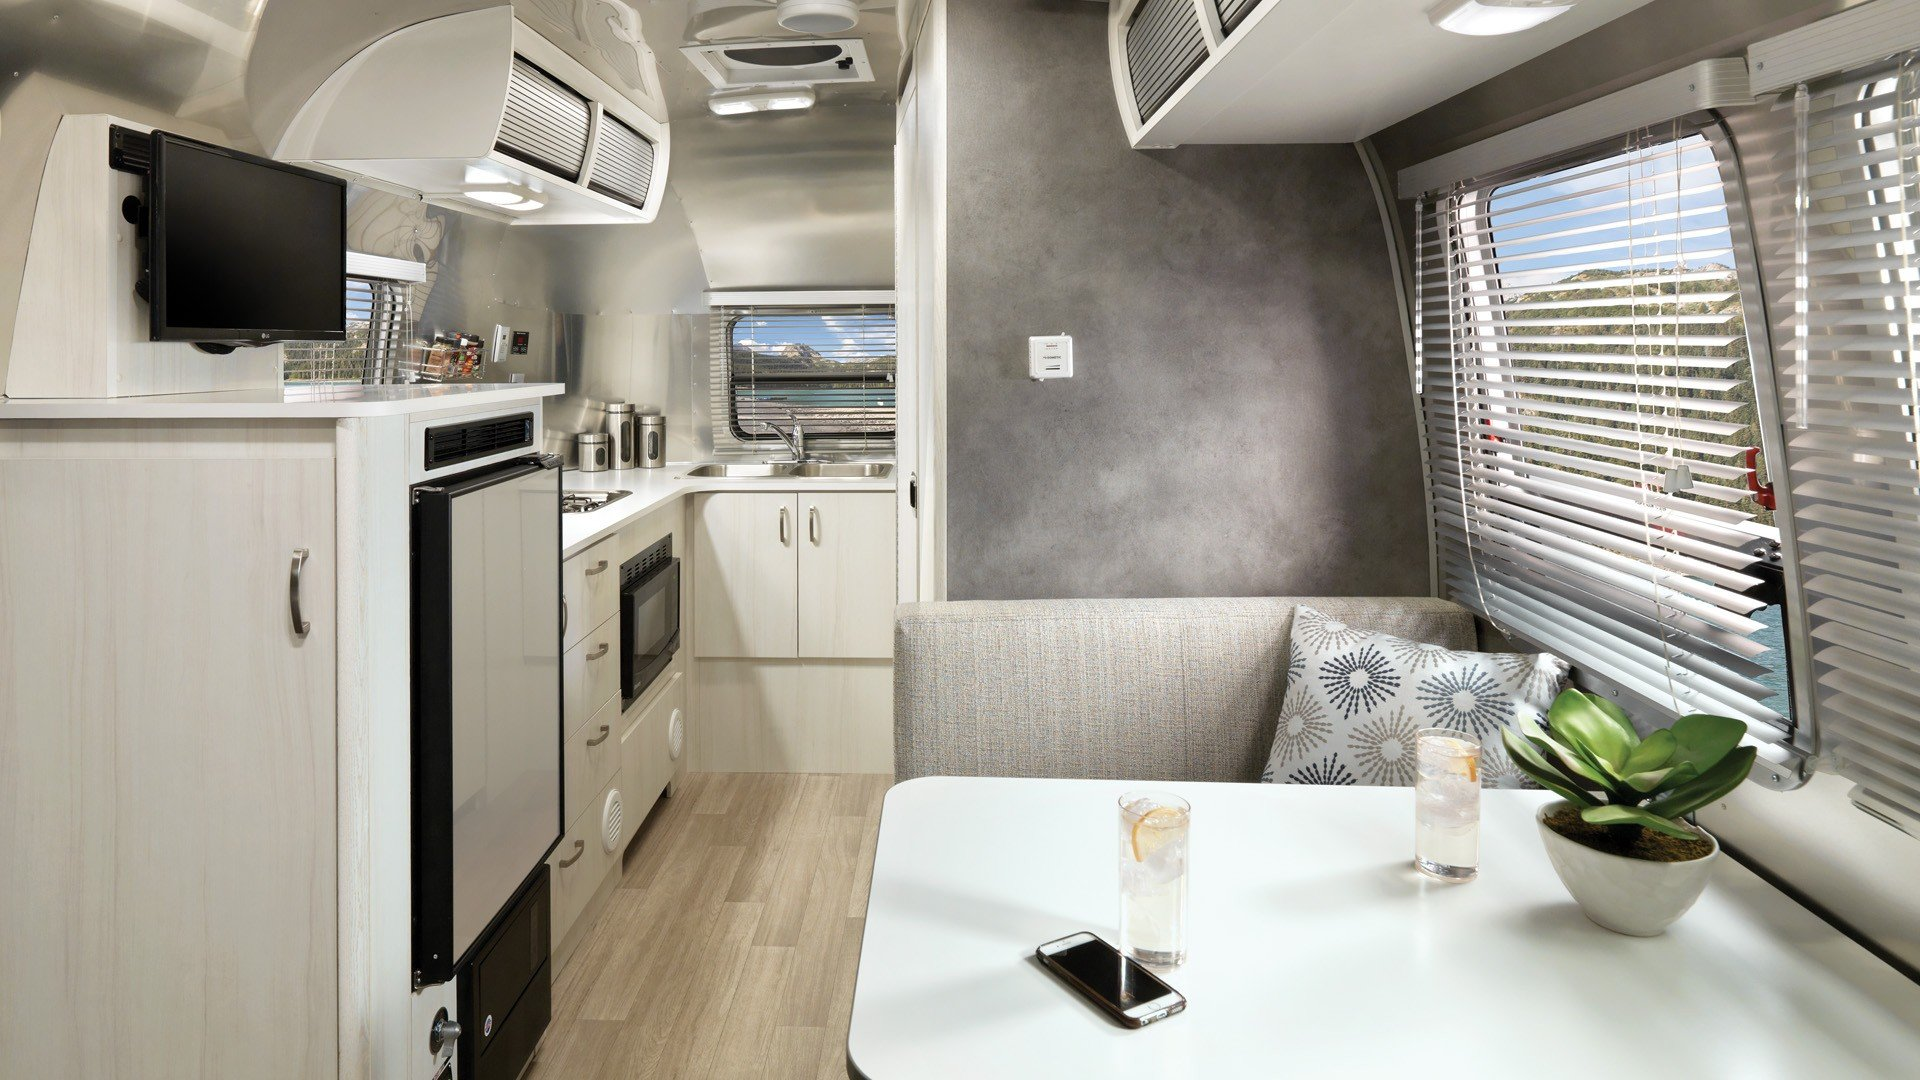 2020 Airstream Bambi Kitchen and Living